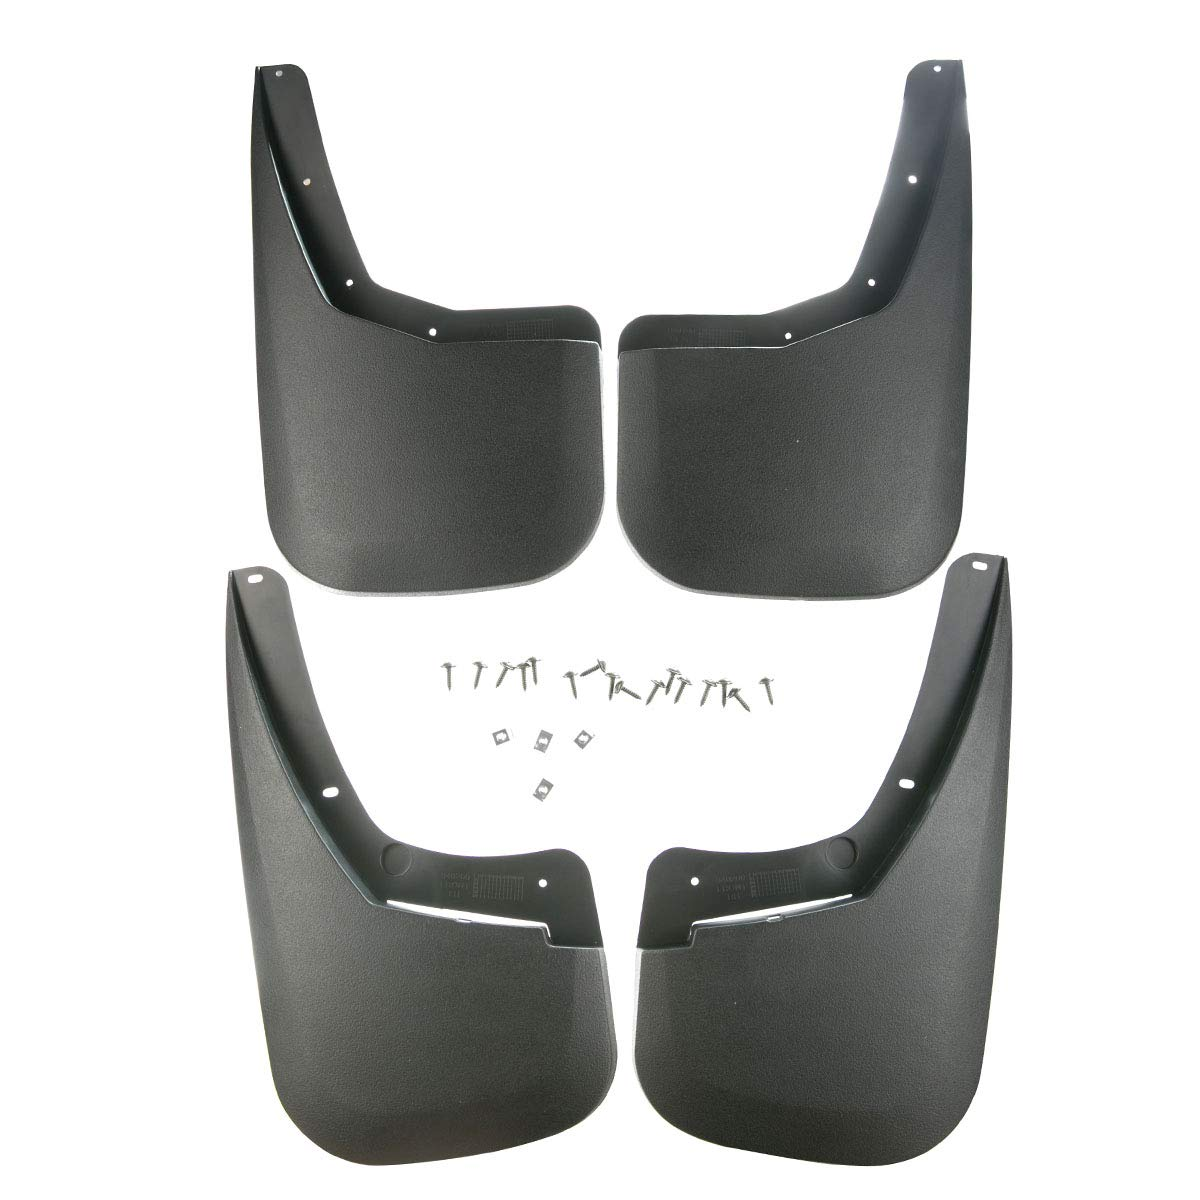 A-Premium Splash Guards Mud Flaps Mudflaps for Chevrolet Silverado 1500 2500 HD 3500 HD 2007-2013 Single Rear Wheels only 4-PC Set PremiumpartsWhosale